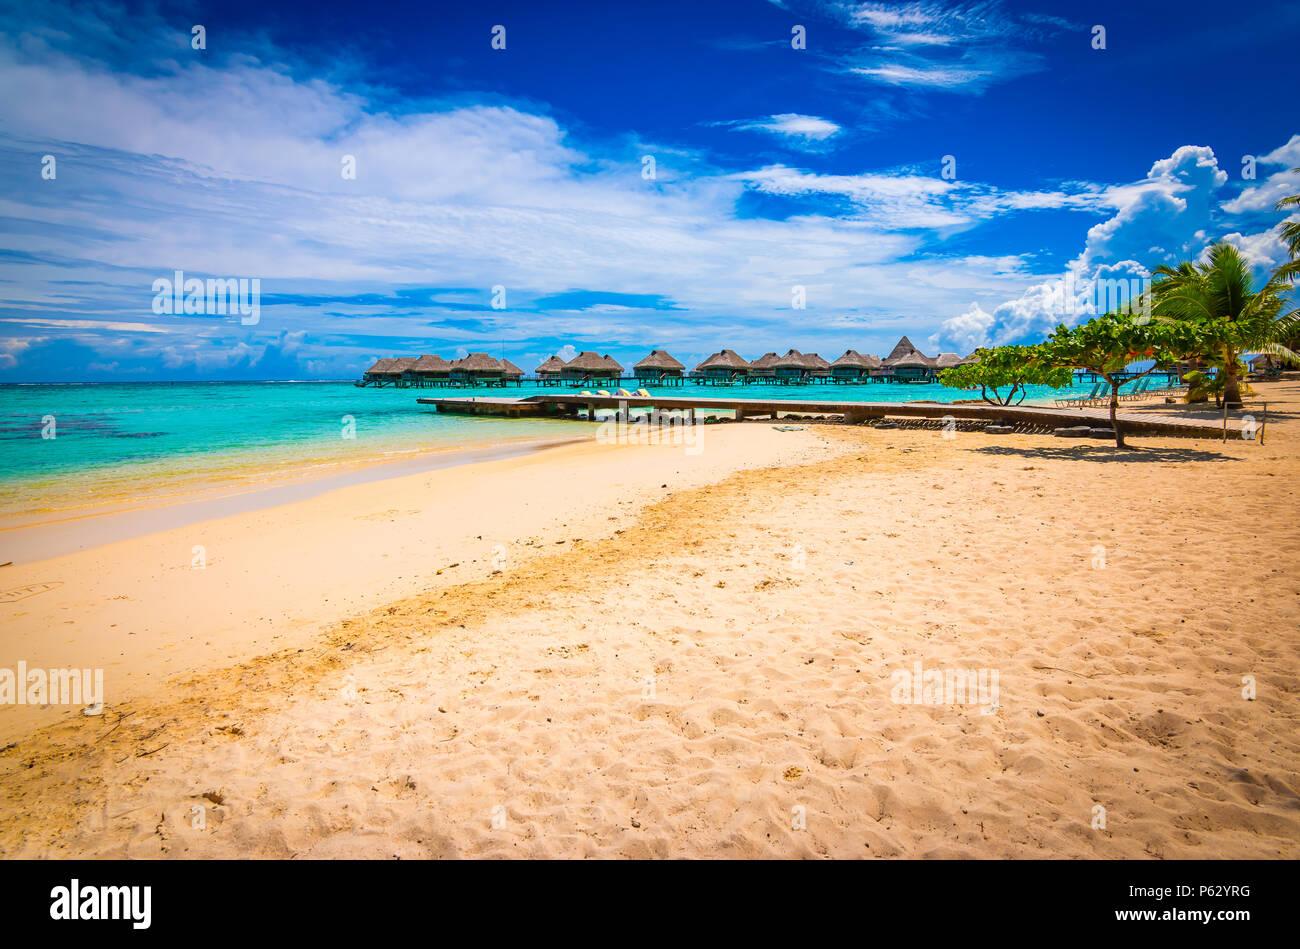 Moorea beach vacation - Stock Image